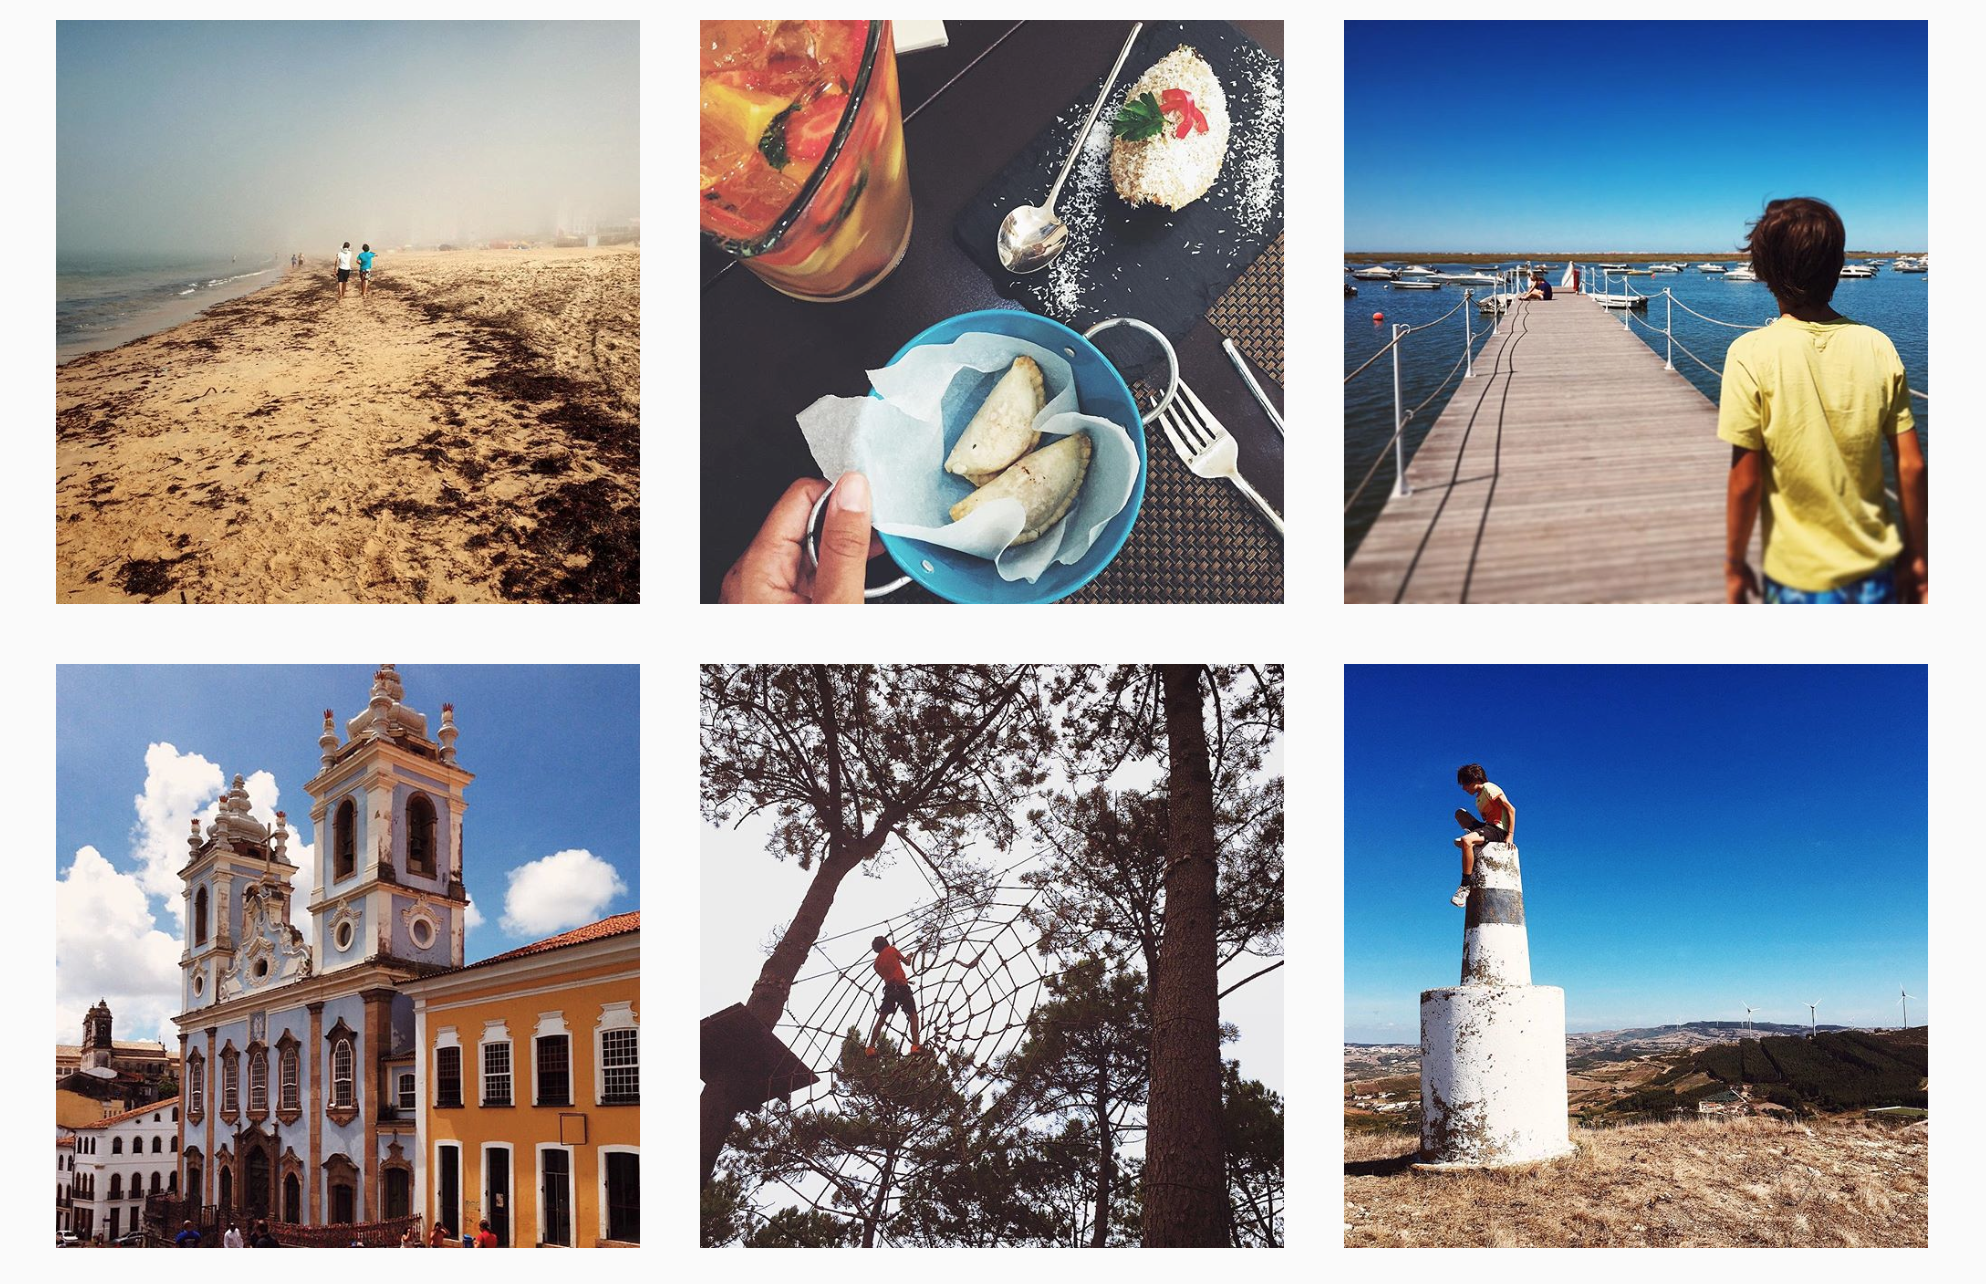 instagram viajar em familia 3